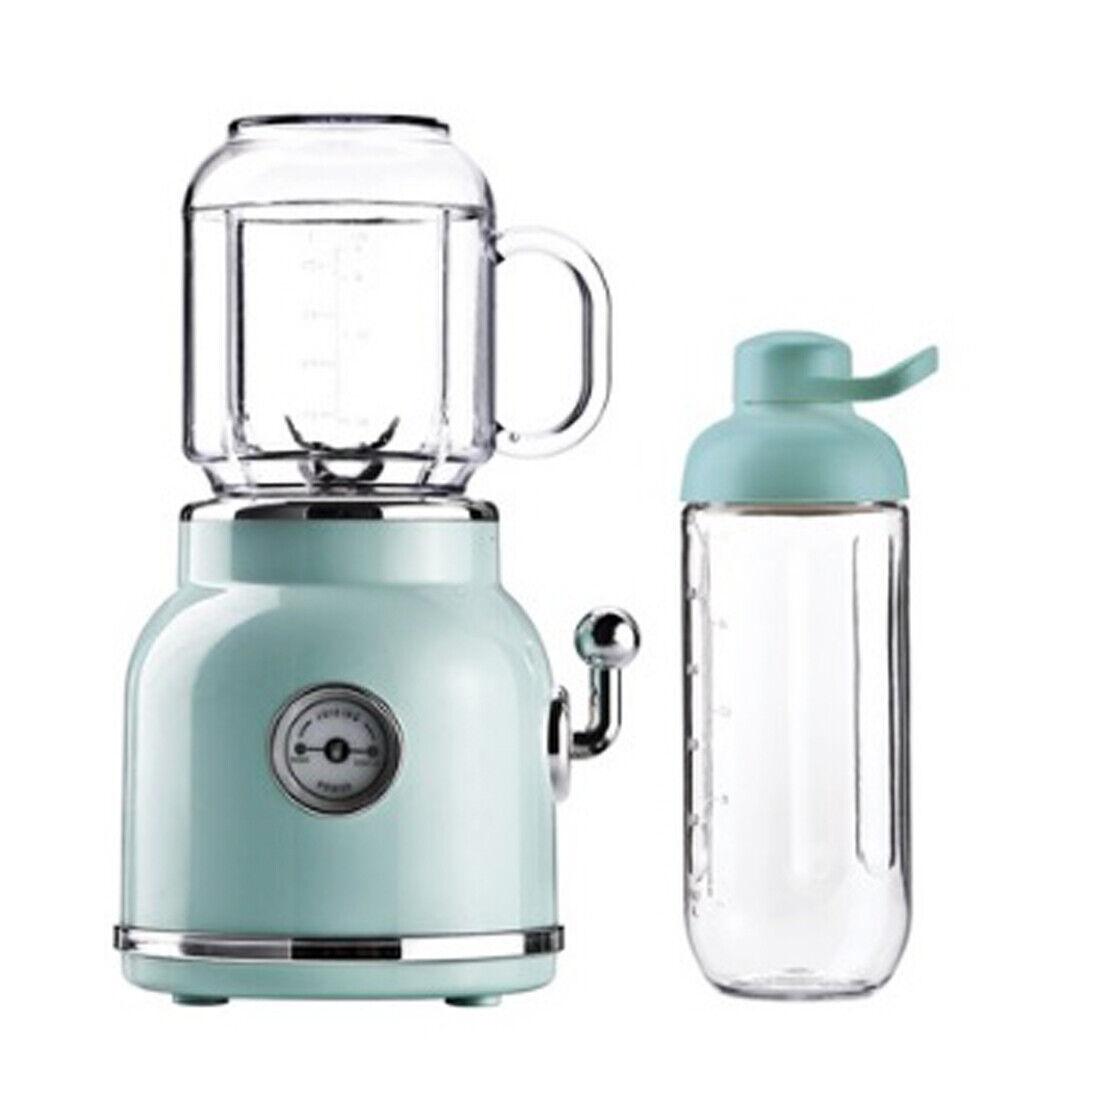 Cuisine Fleur Rétro Mini Blender Tritan BPA BPA Free Jar Smoothie Glace Crush Ble